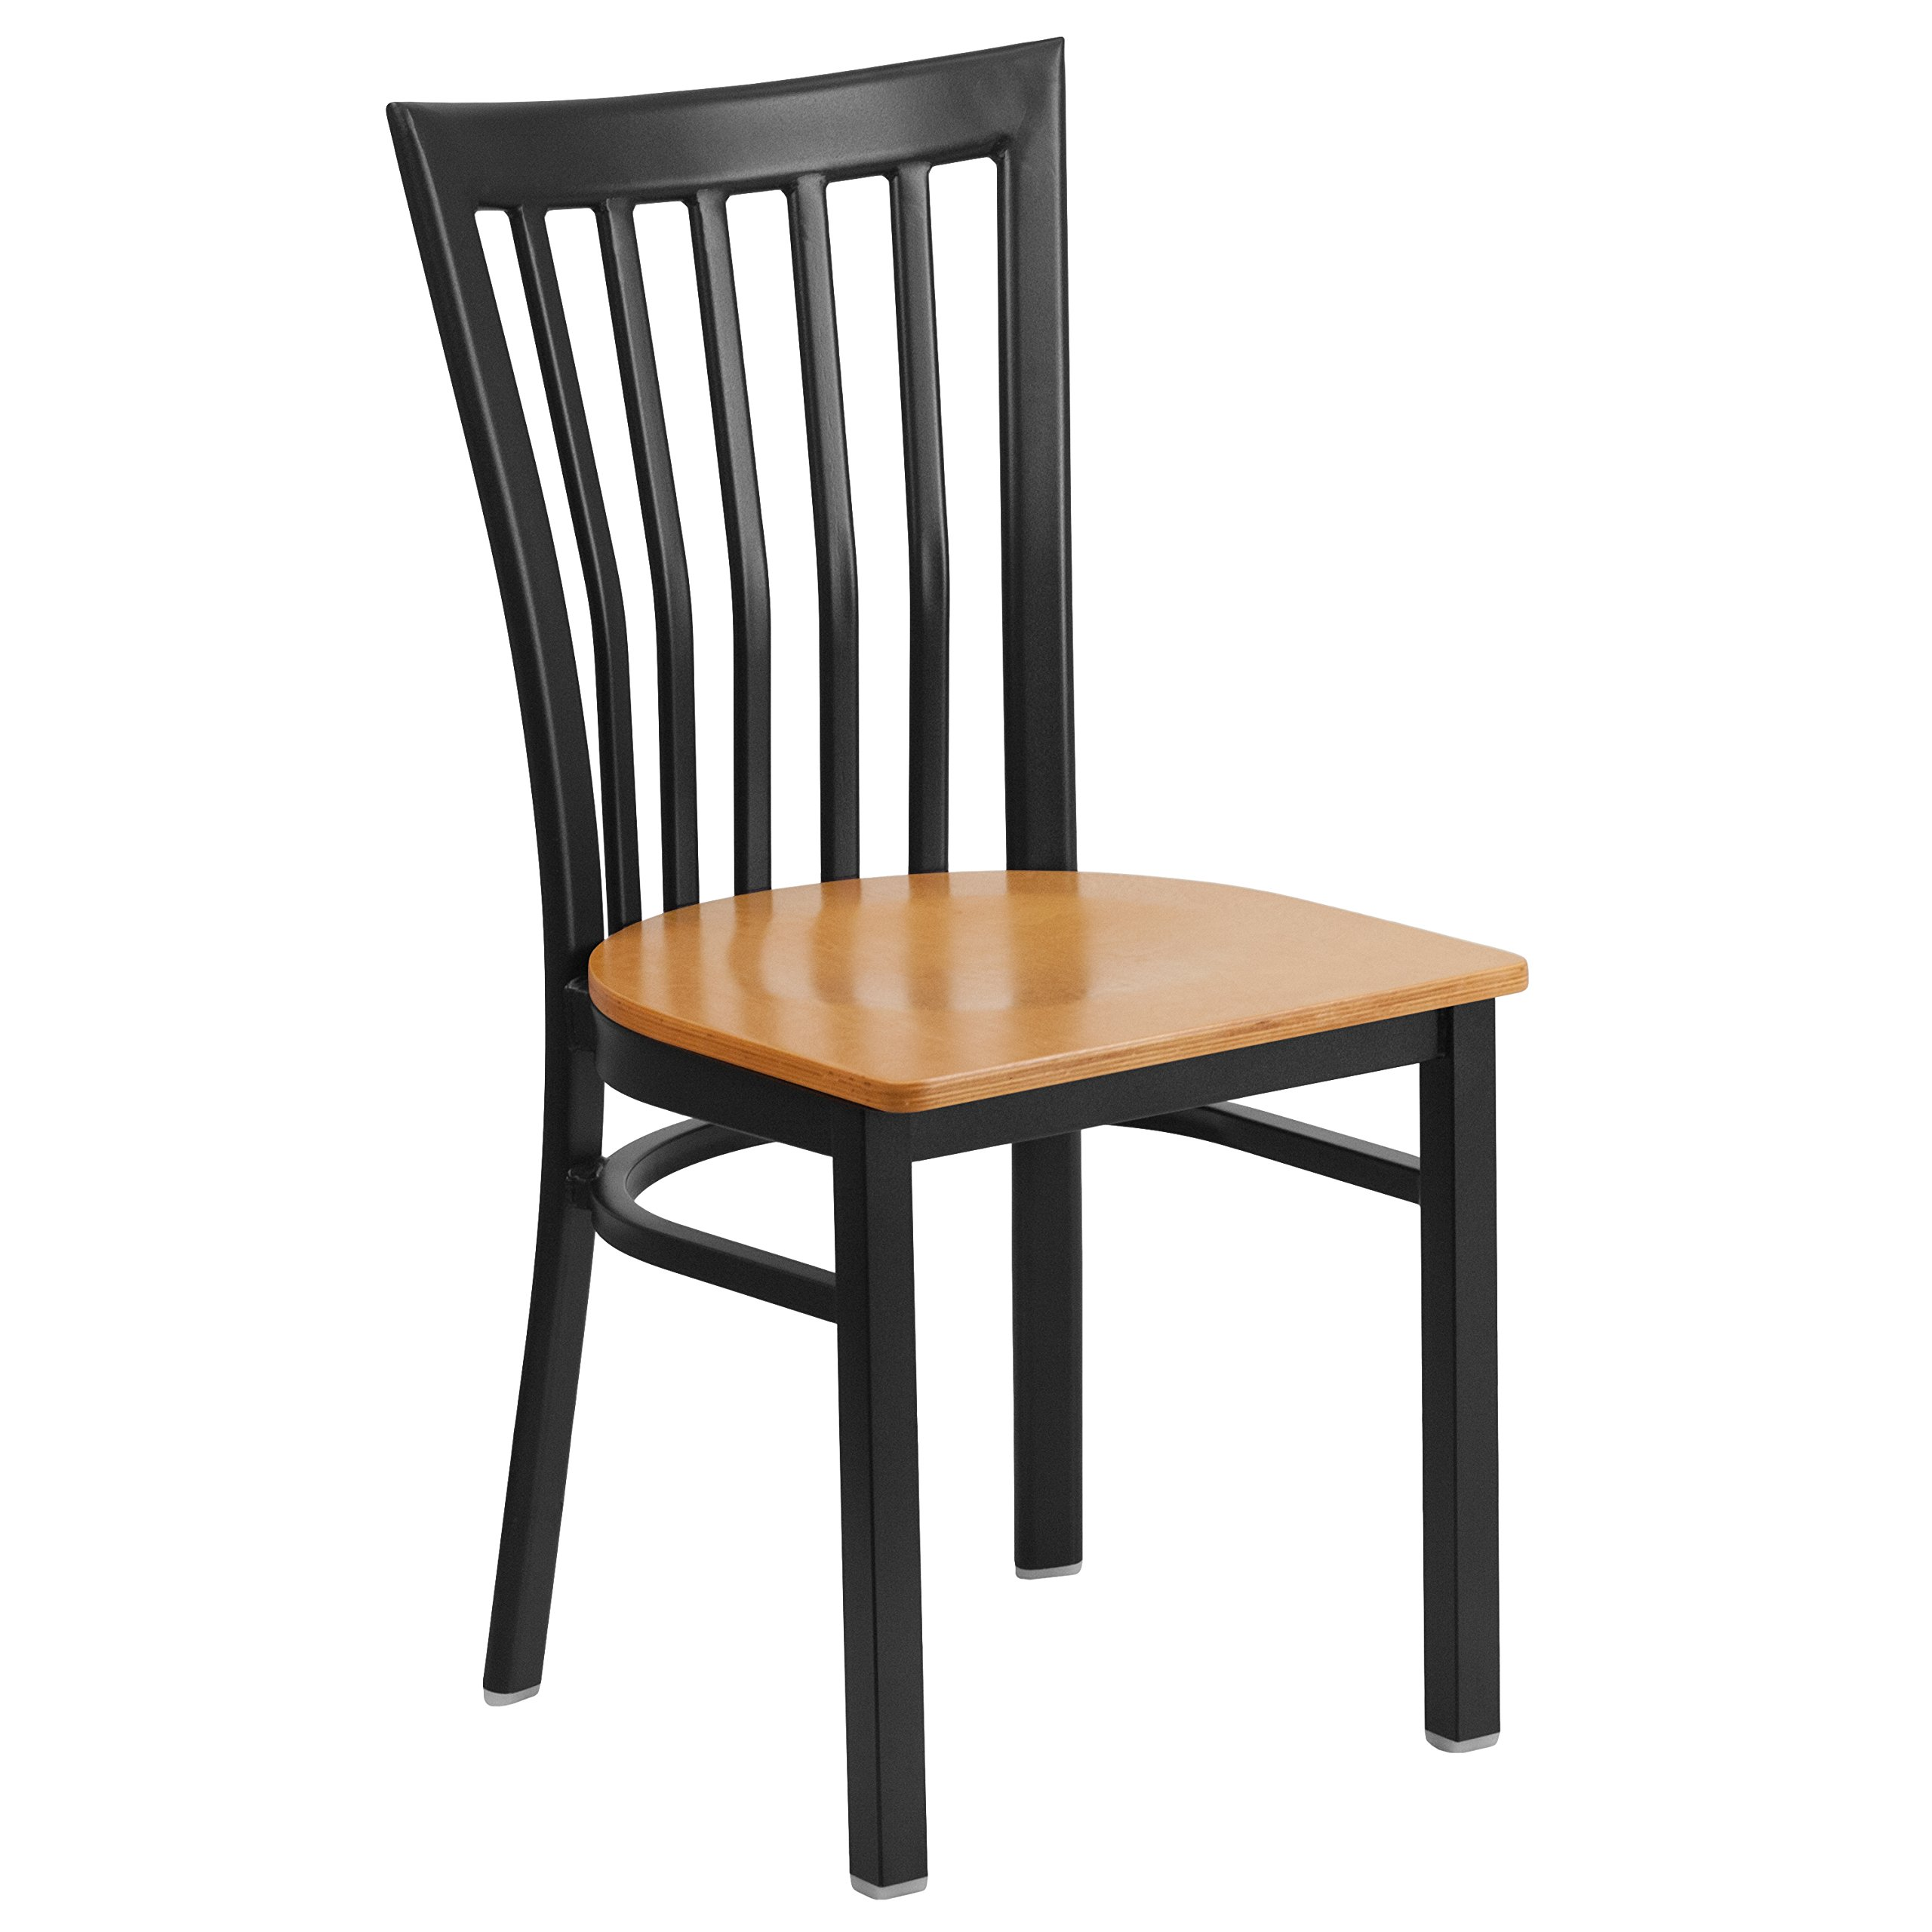 Flash Furniture HERCULES Series Black School House Back Metal Restaurant Chair - Natural Wood Seat